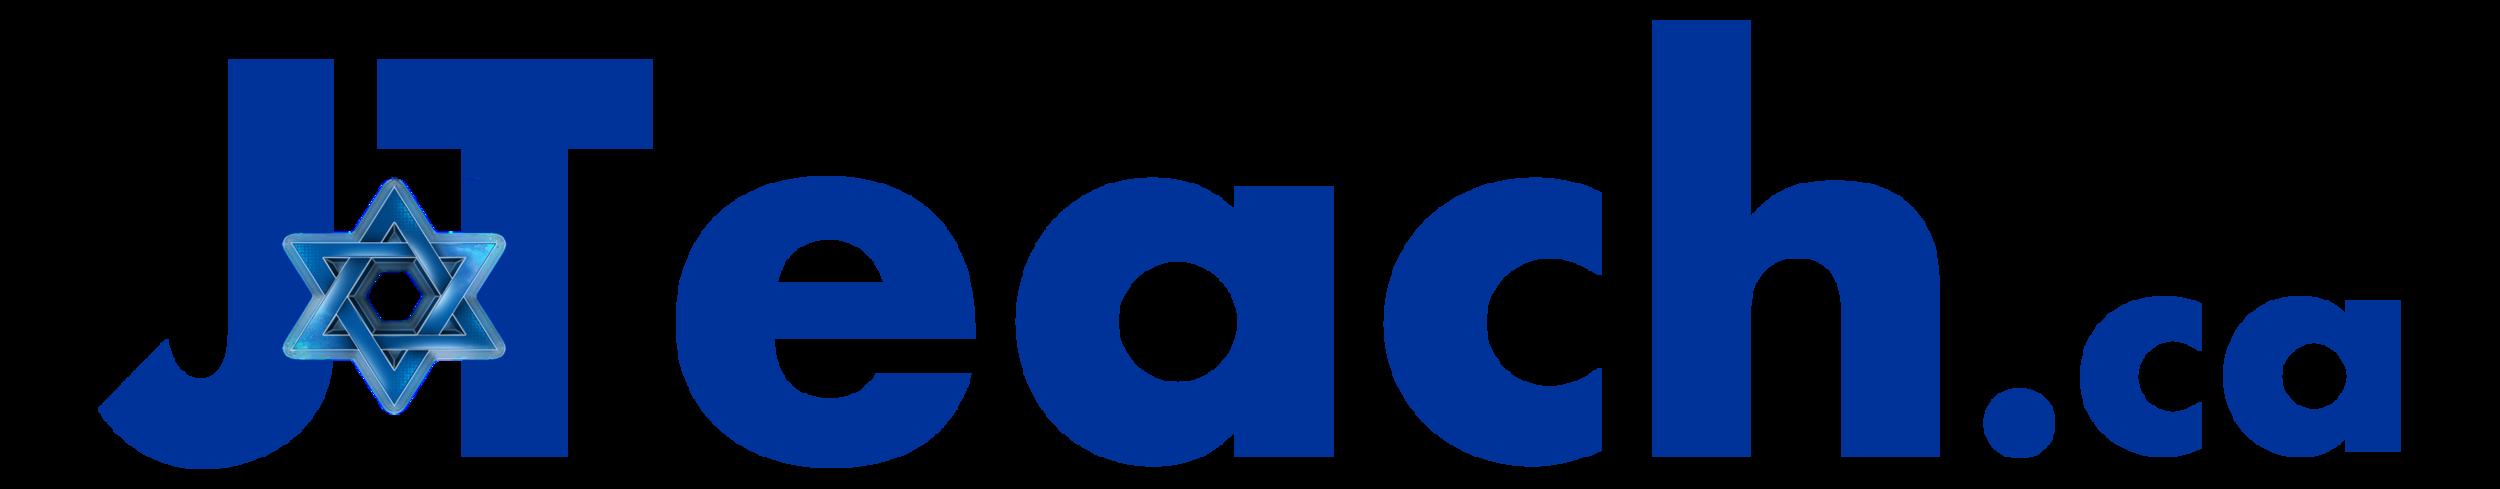 JTeach Logo.png